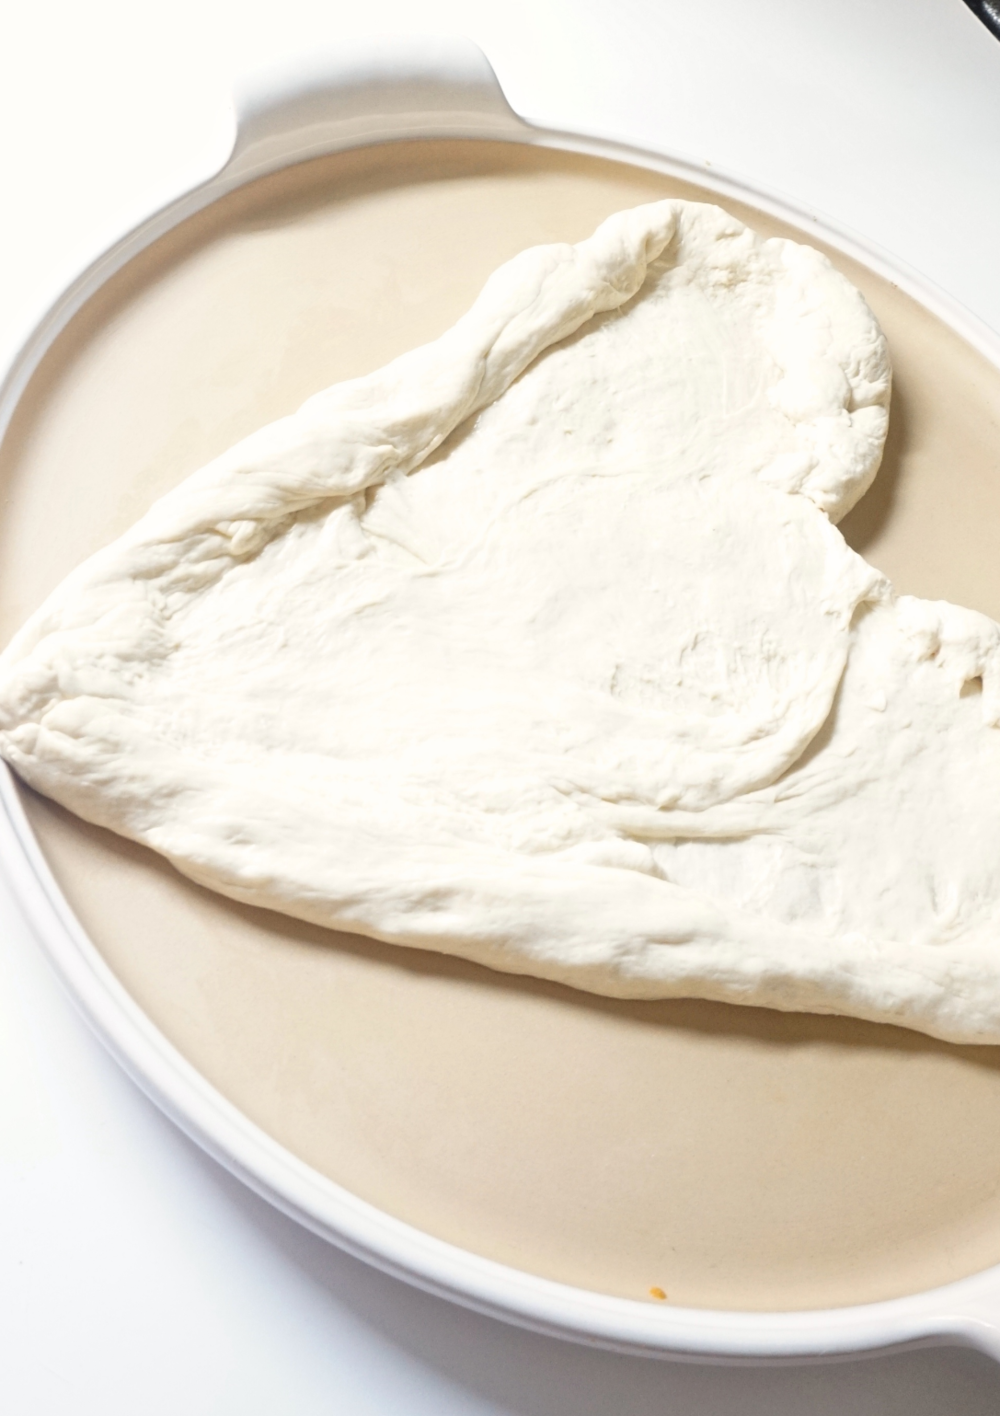 How to Make Zero Waste pizza dough with www.goingzerowaste.com